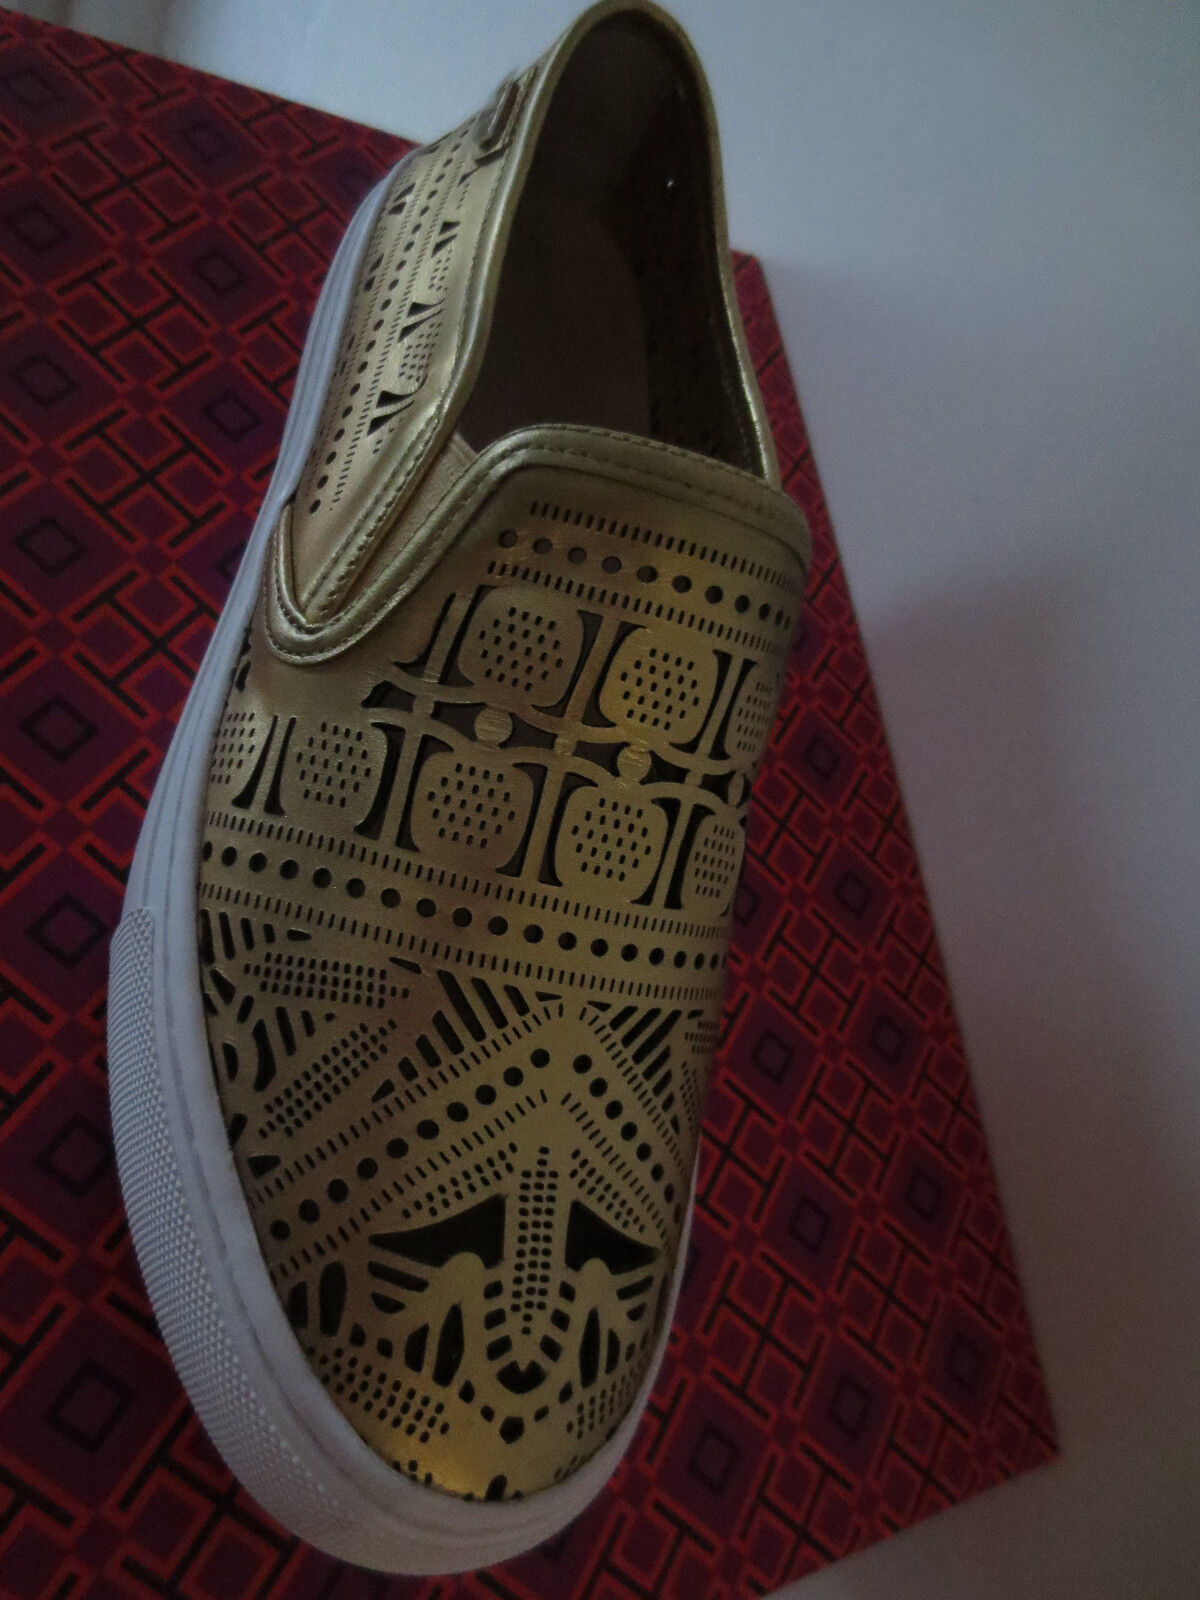 TORY BURCH Leder Sneakers Bronze Metallic Gr.40,5 *  9,5 Leder BURCH Schuhe Sneaker 12168241 123cf3